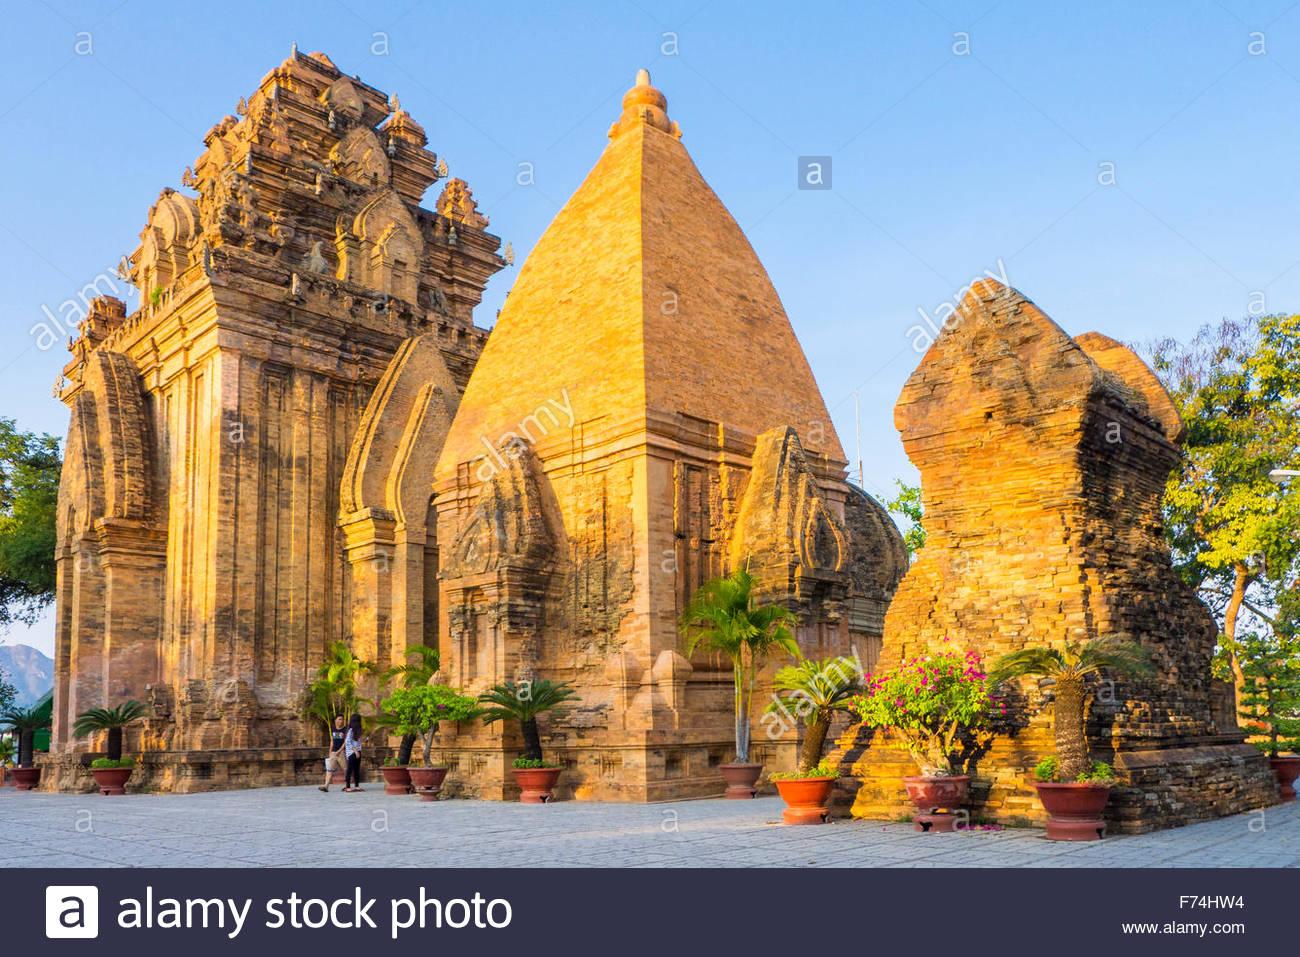 Temple de Po Nagar Cham tours, Nha Trang, province de Khanh Hoa, Vietnam Photo Stock